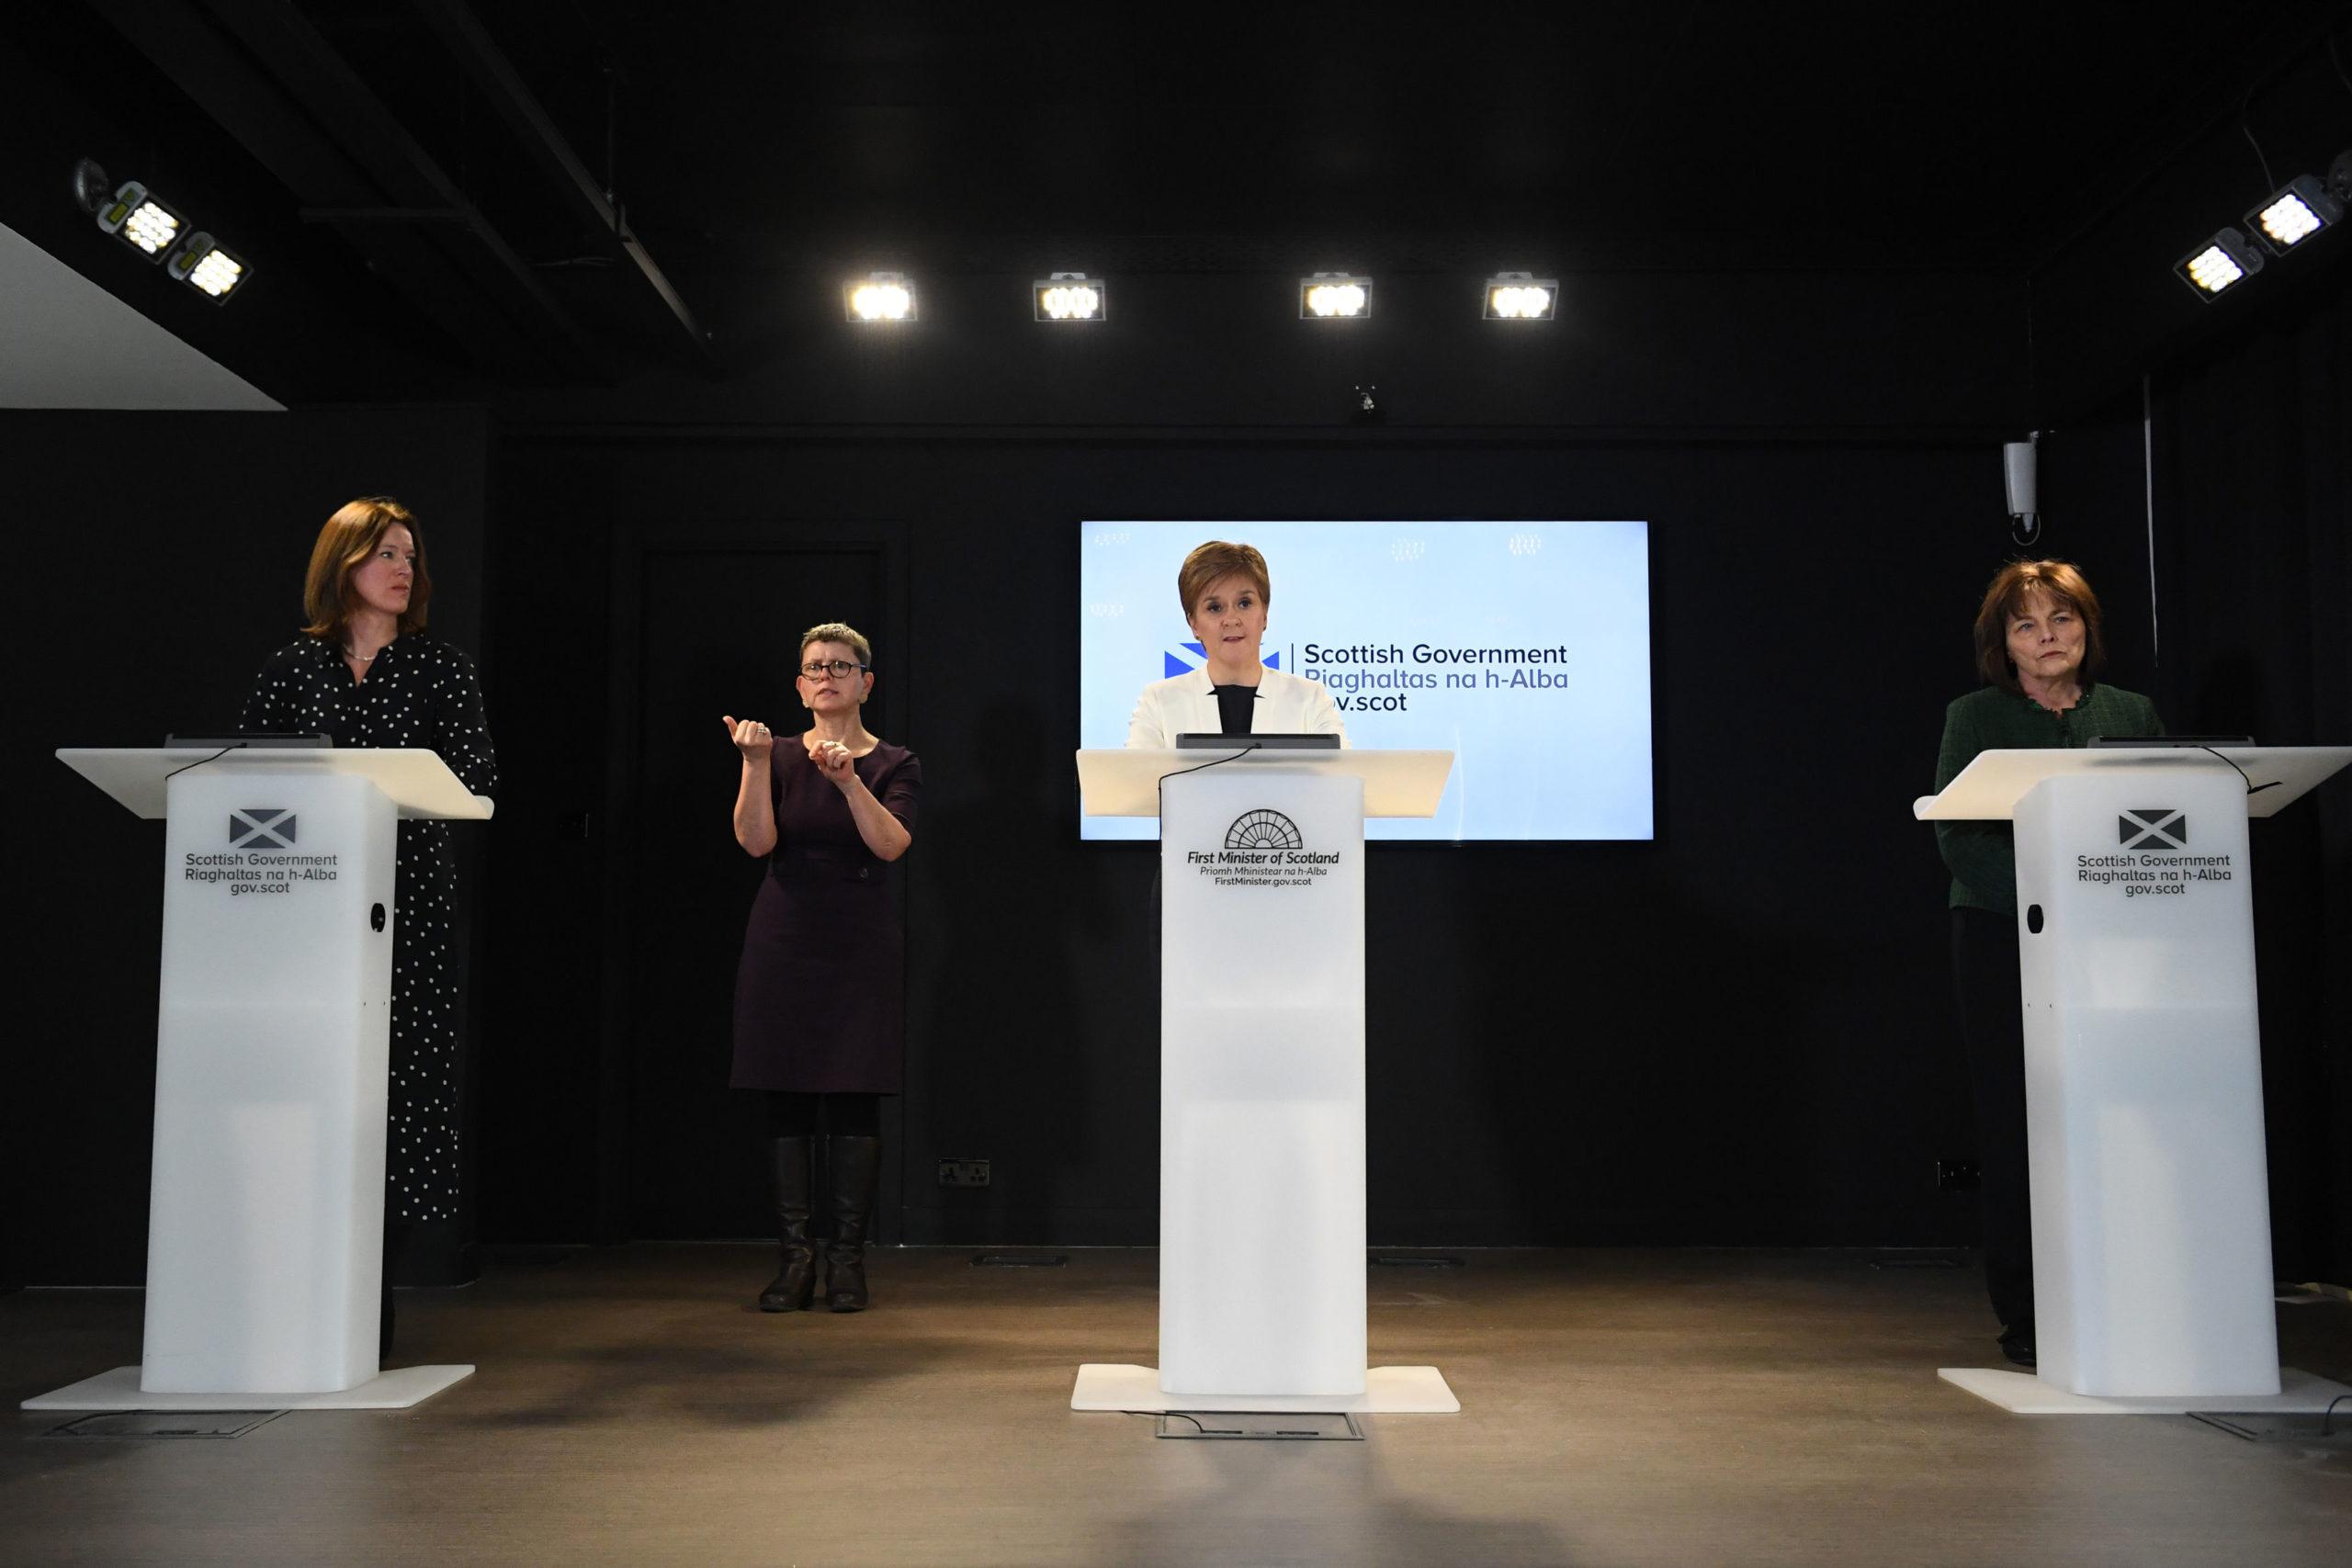 Chief Medical Officer Dr Catherine Calderwood, Scotland's First Minister Nicola Sturgeon and Scotland's Health Secretary Jeane Freeman.